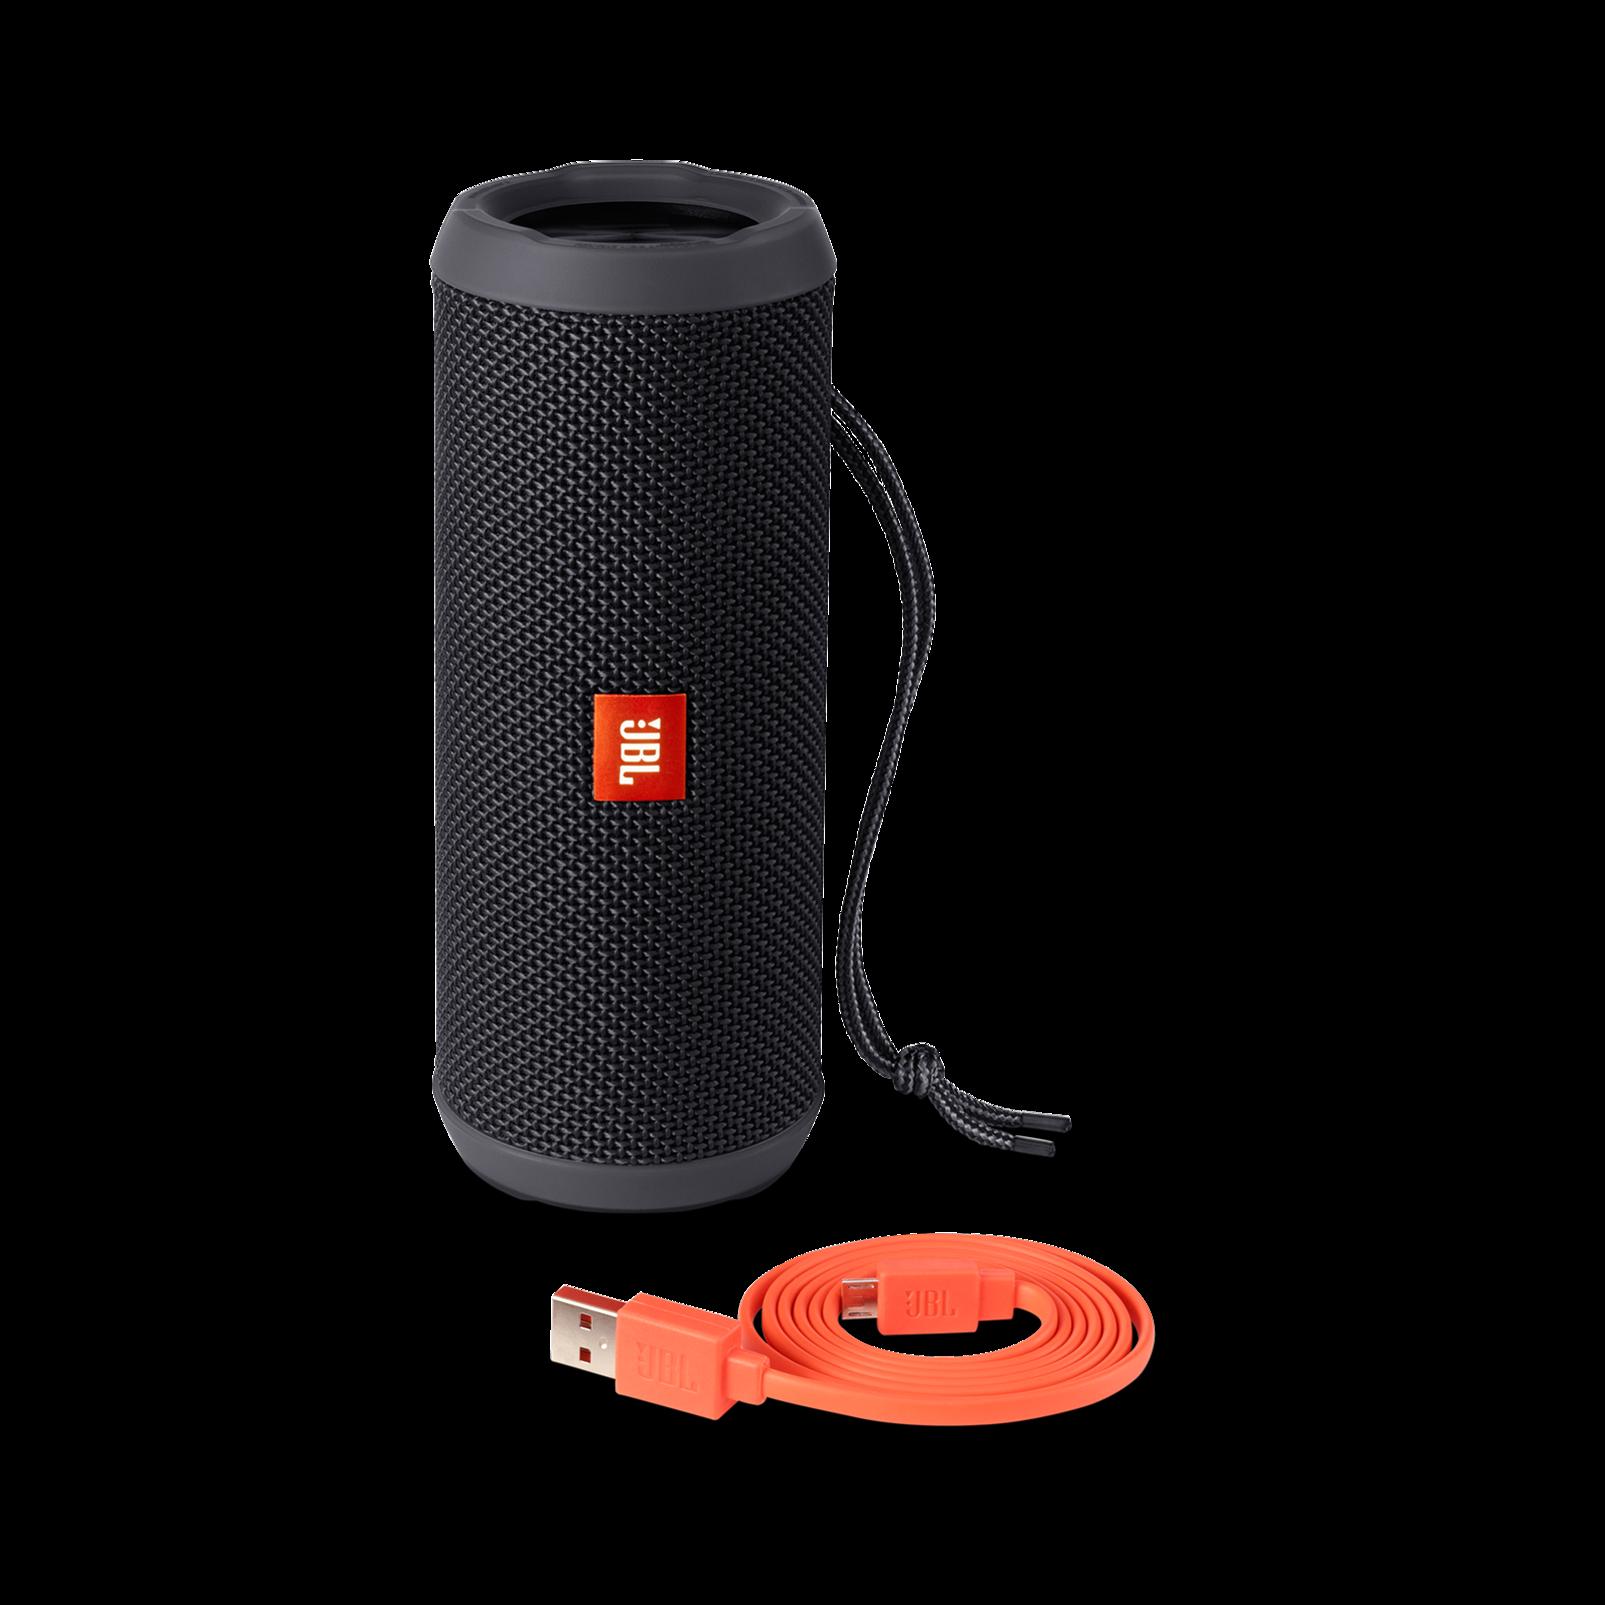 JBL Flip 3 - Black - Splashproof portable Bluetooth speaker with powerful sound and speakerphone technology - Detailshot 4